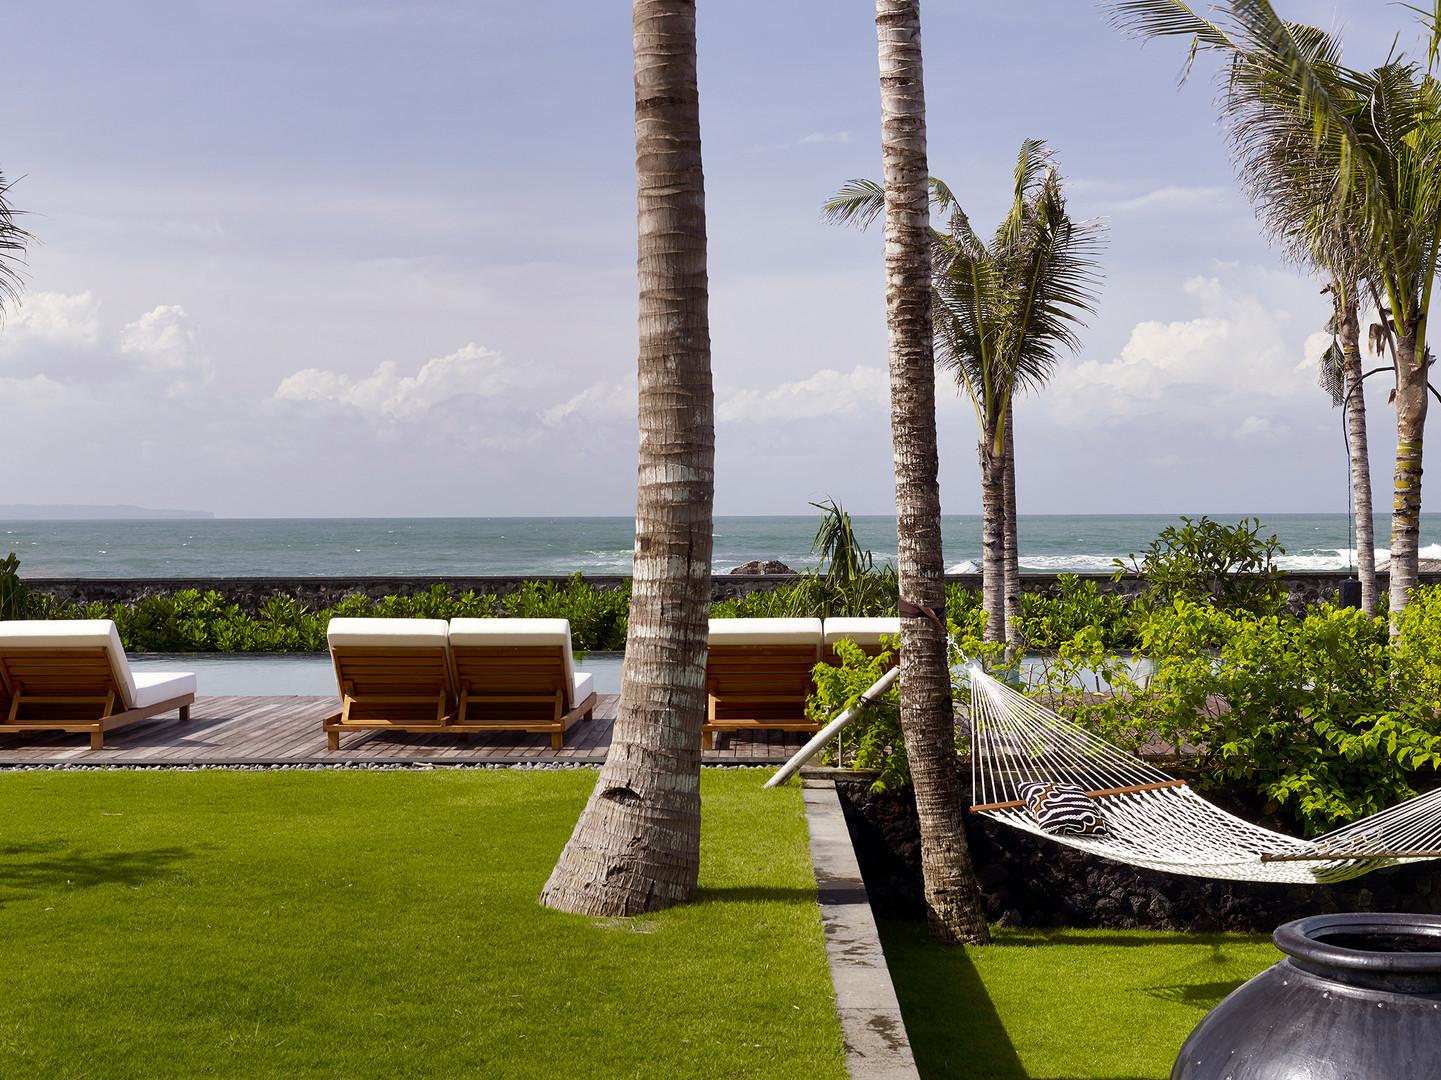 26-Arnalaya Beach House - Garden pool an